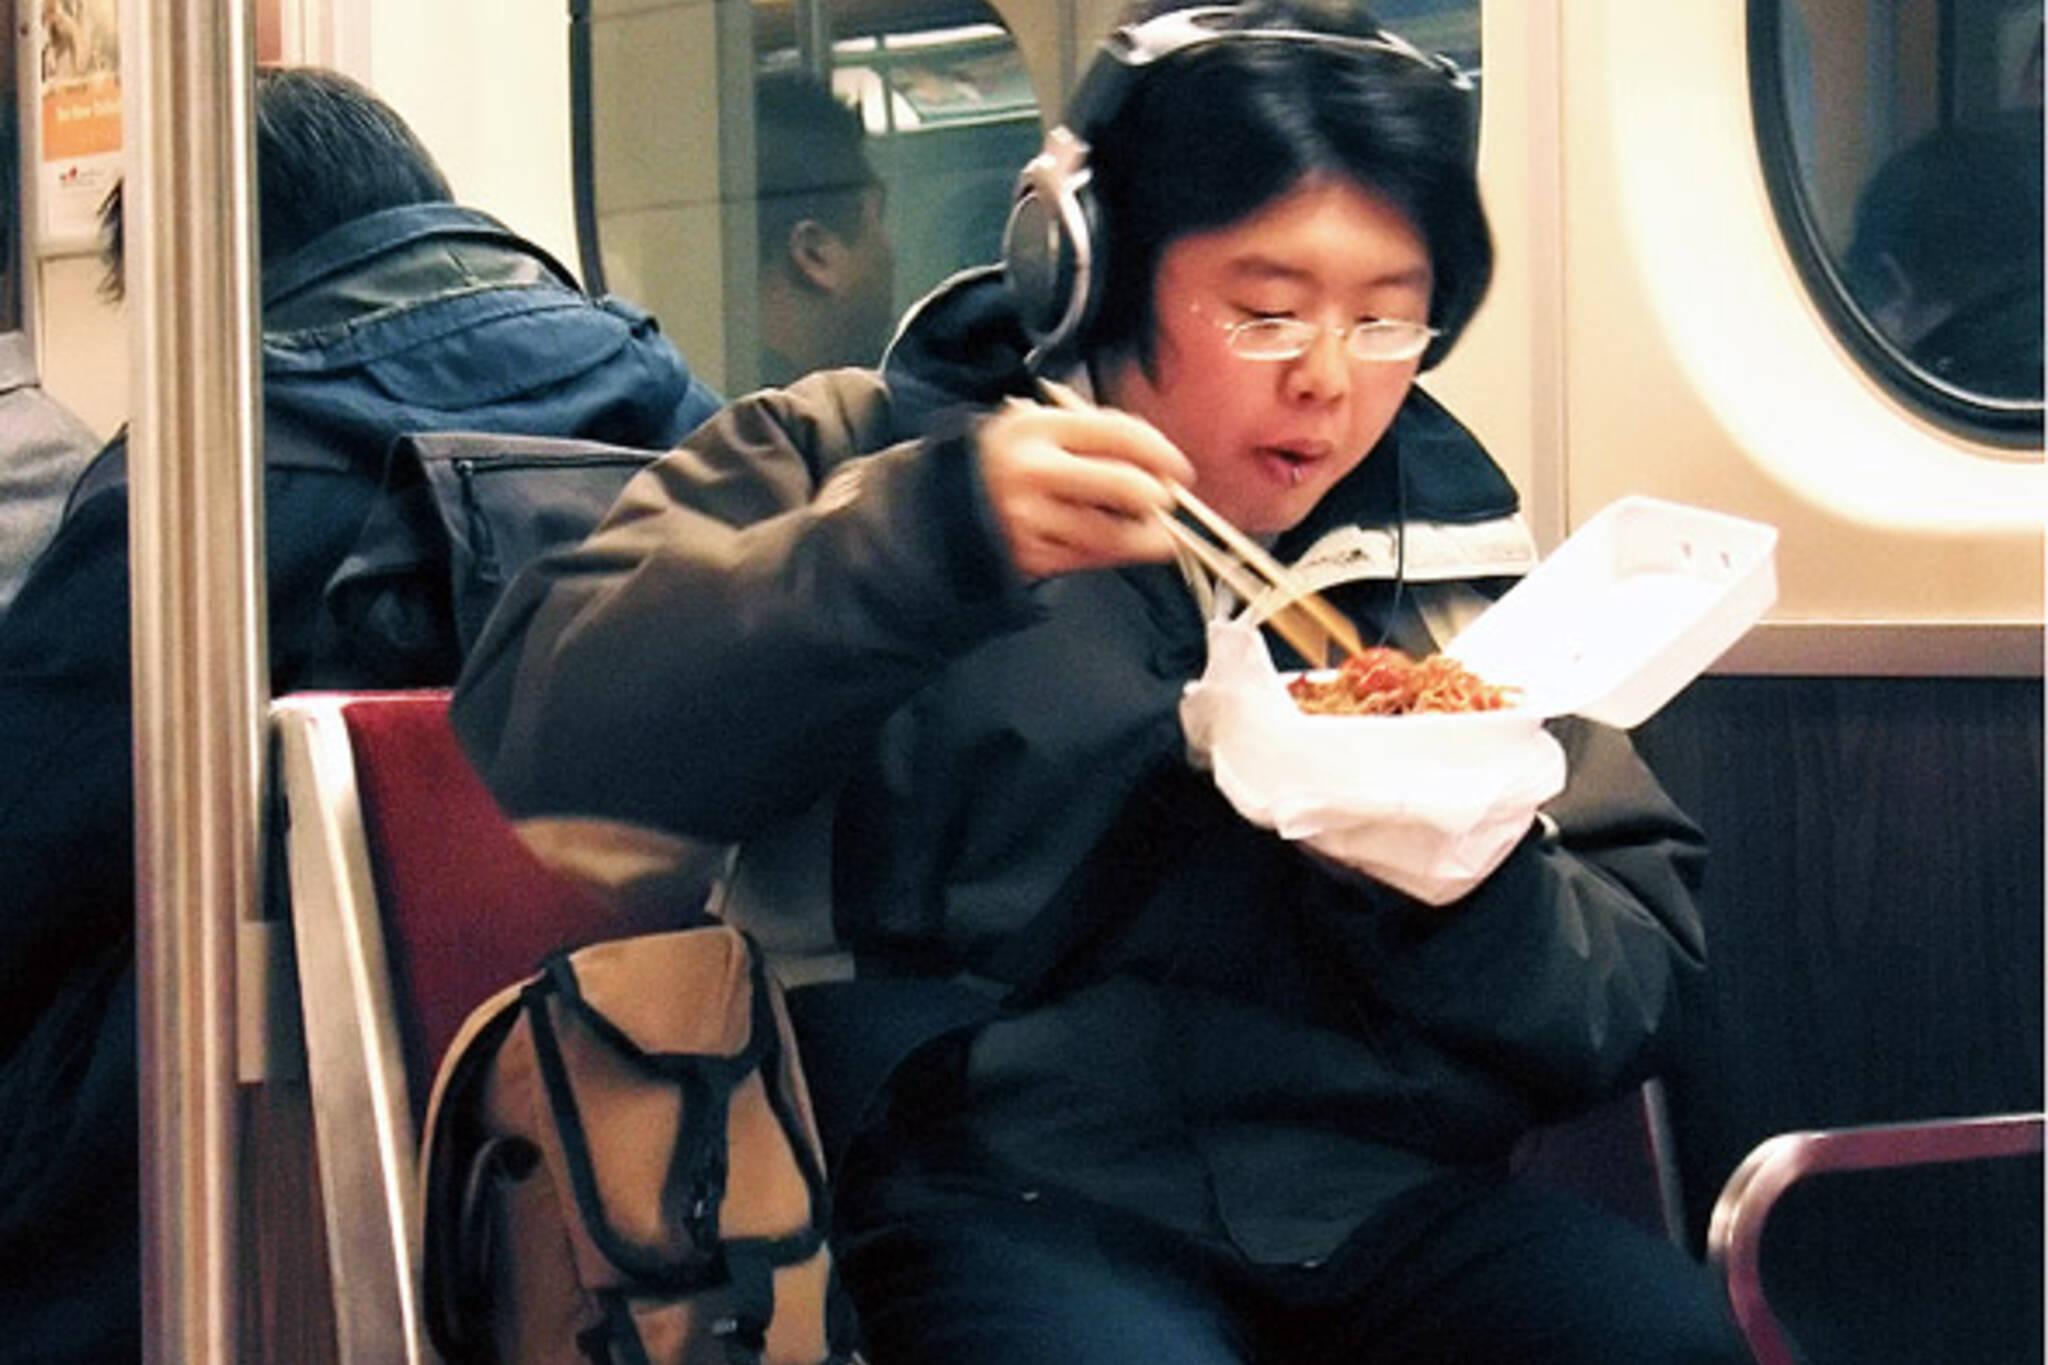 TTC ban food eating